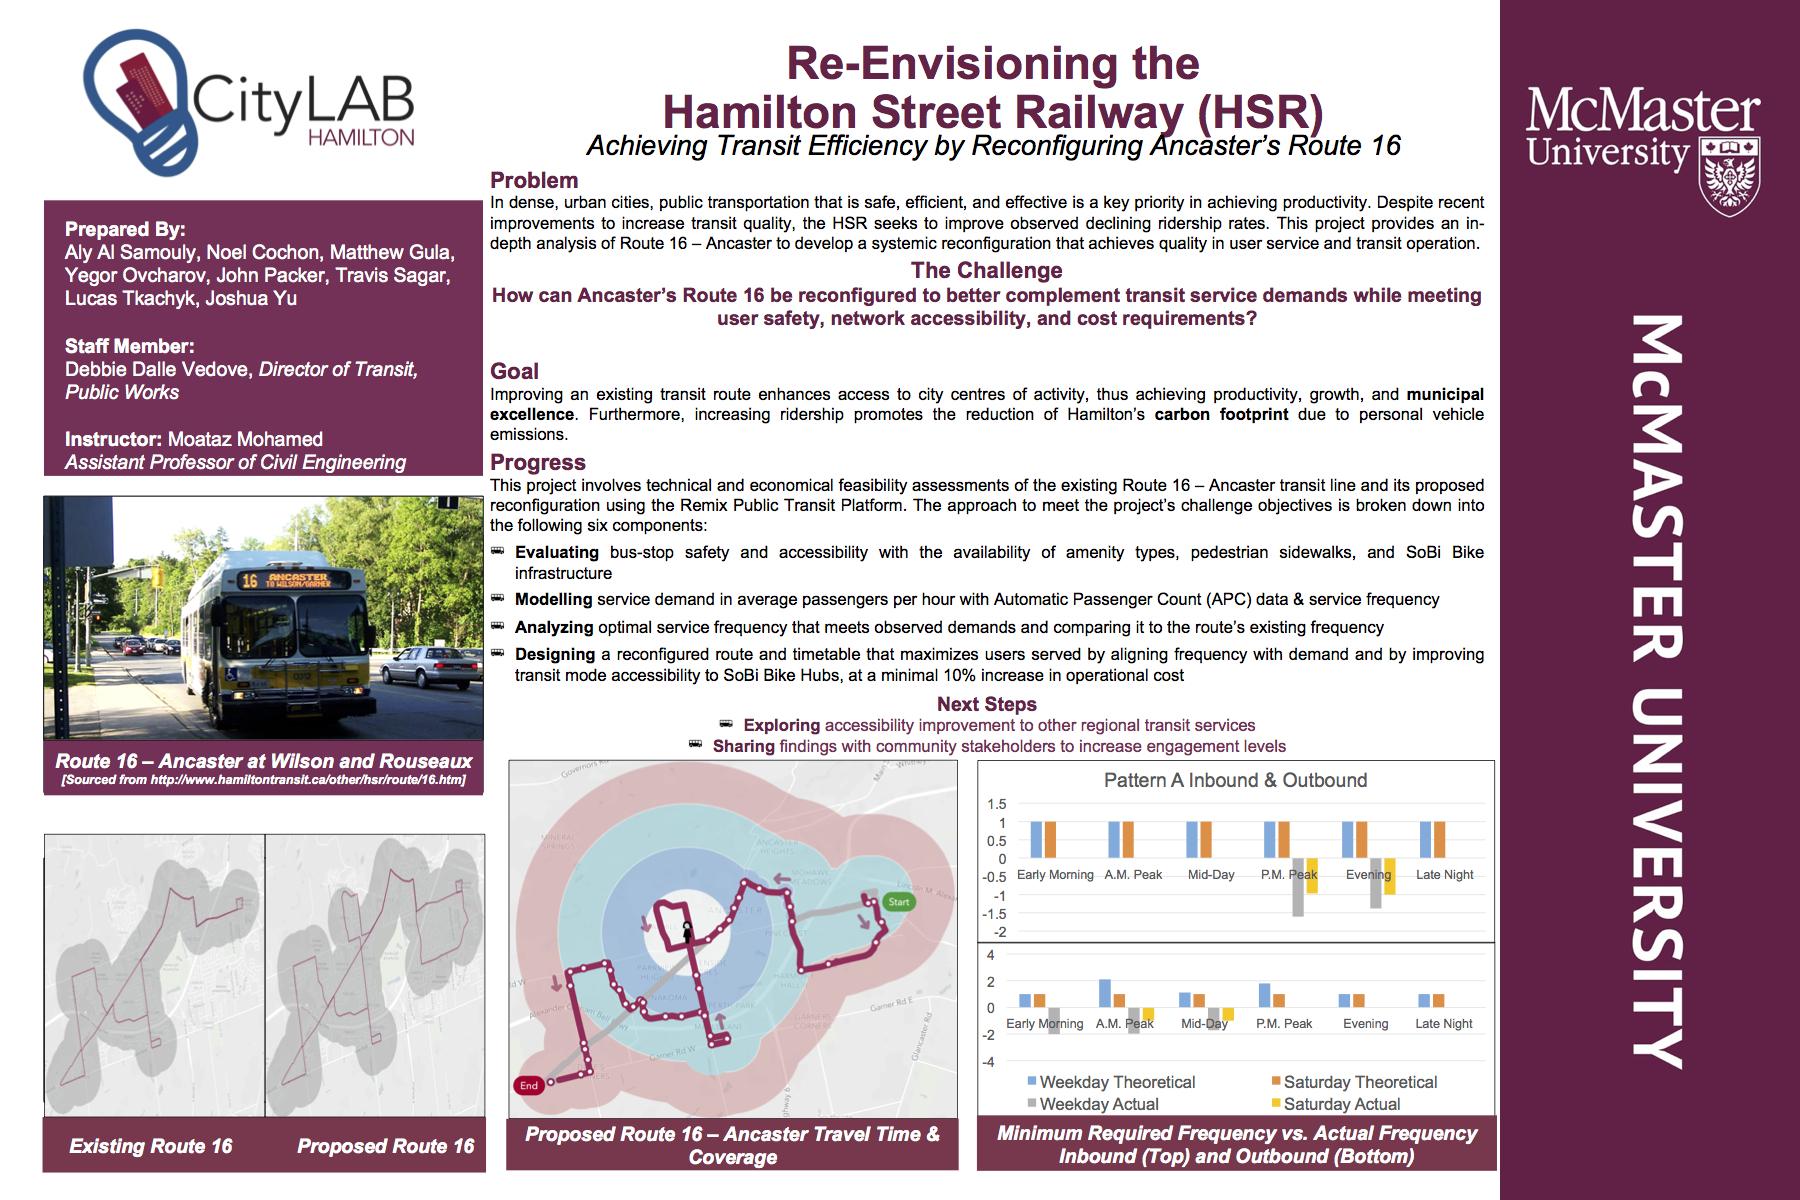 ReEnvisioning the HSR - Debbie Dalle Vedove.jpg